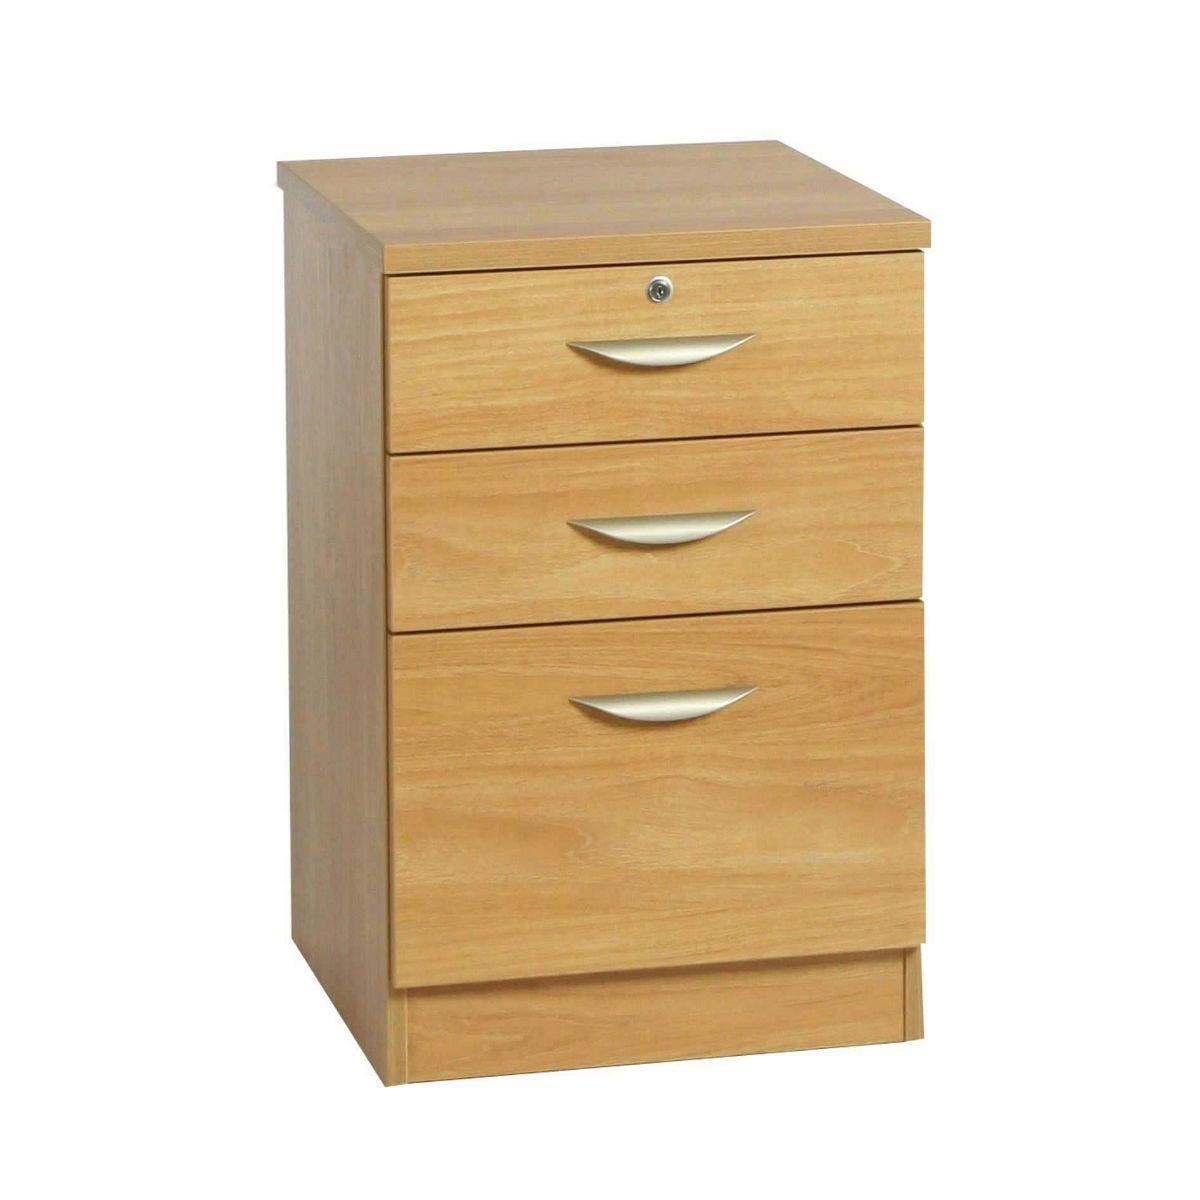 R White Combination Cabinet 3 Drawer B-3CU H728xW479xD540mm, English Oak